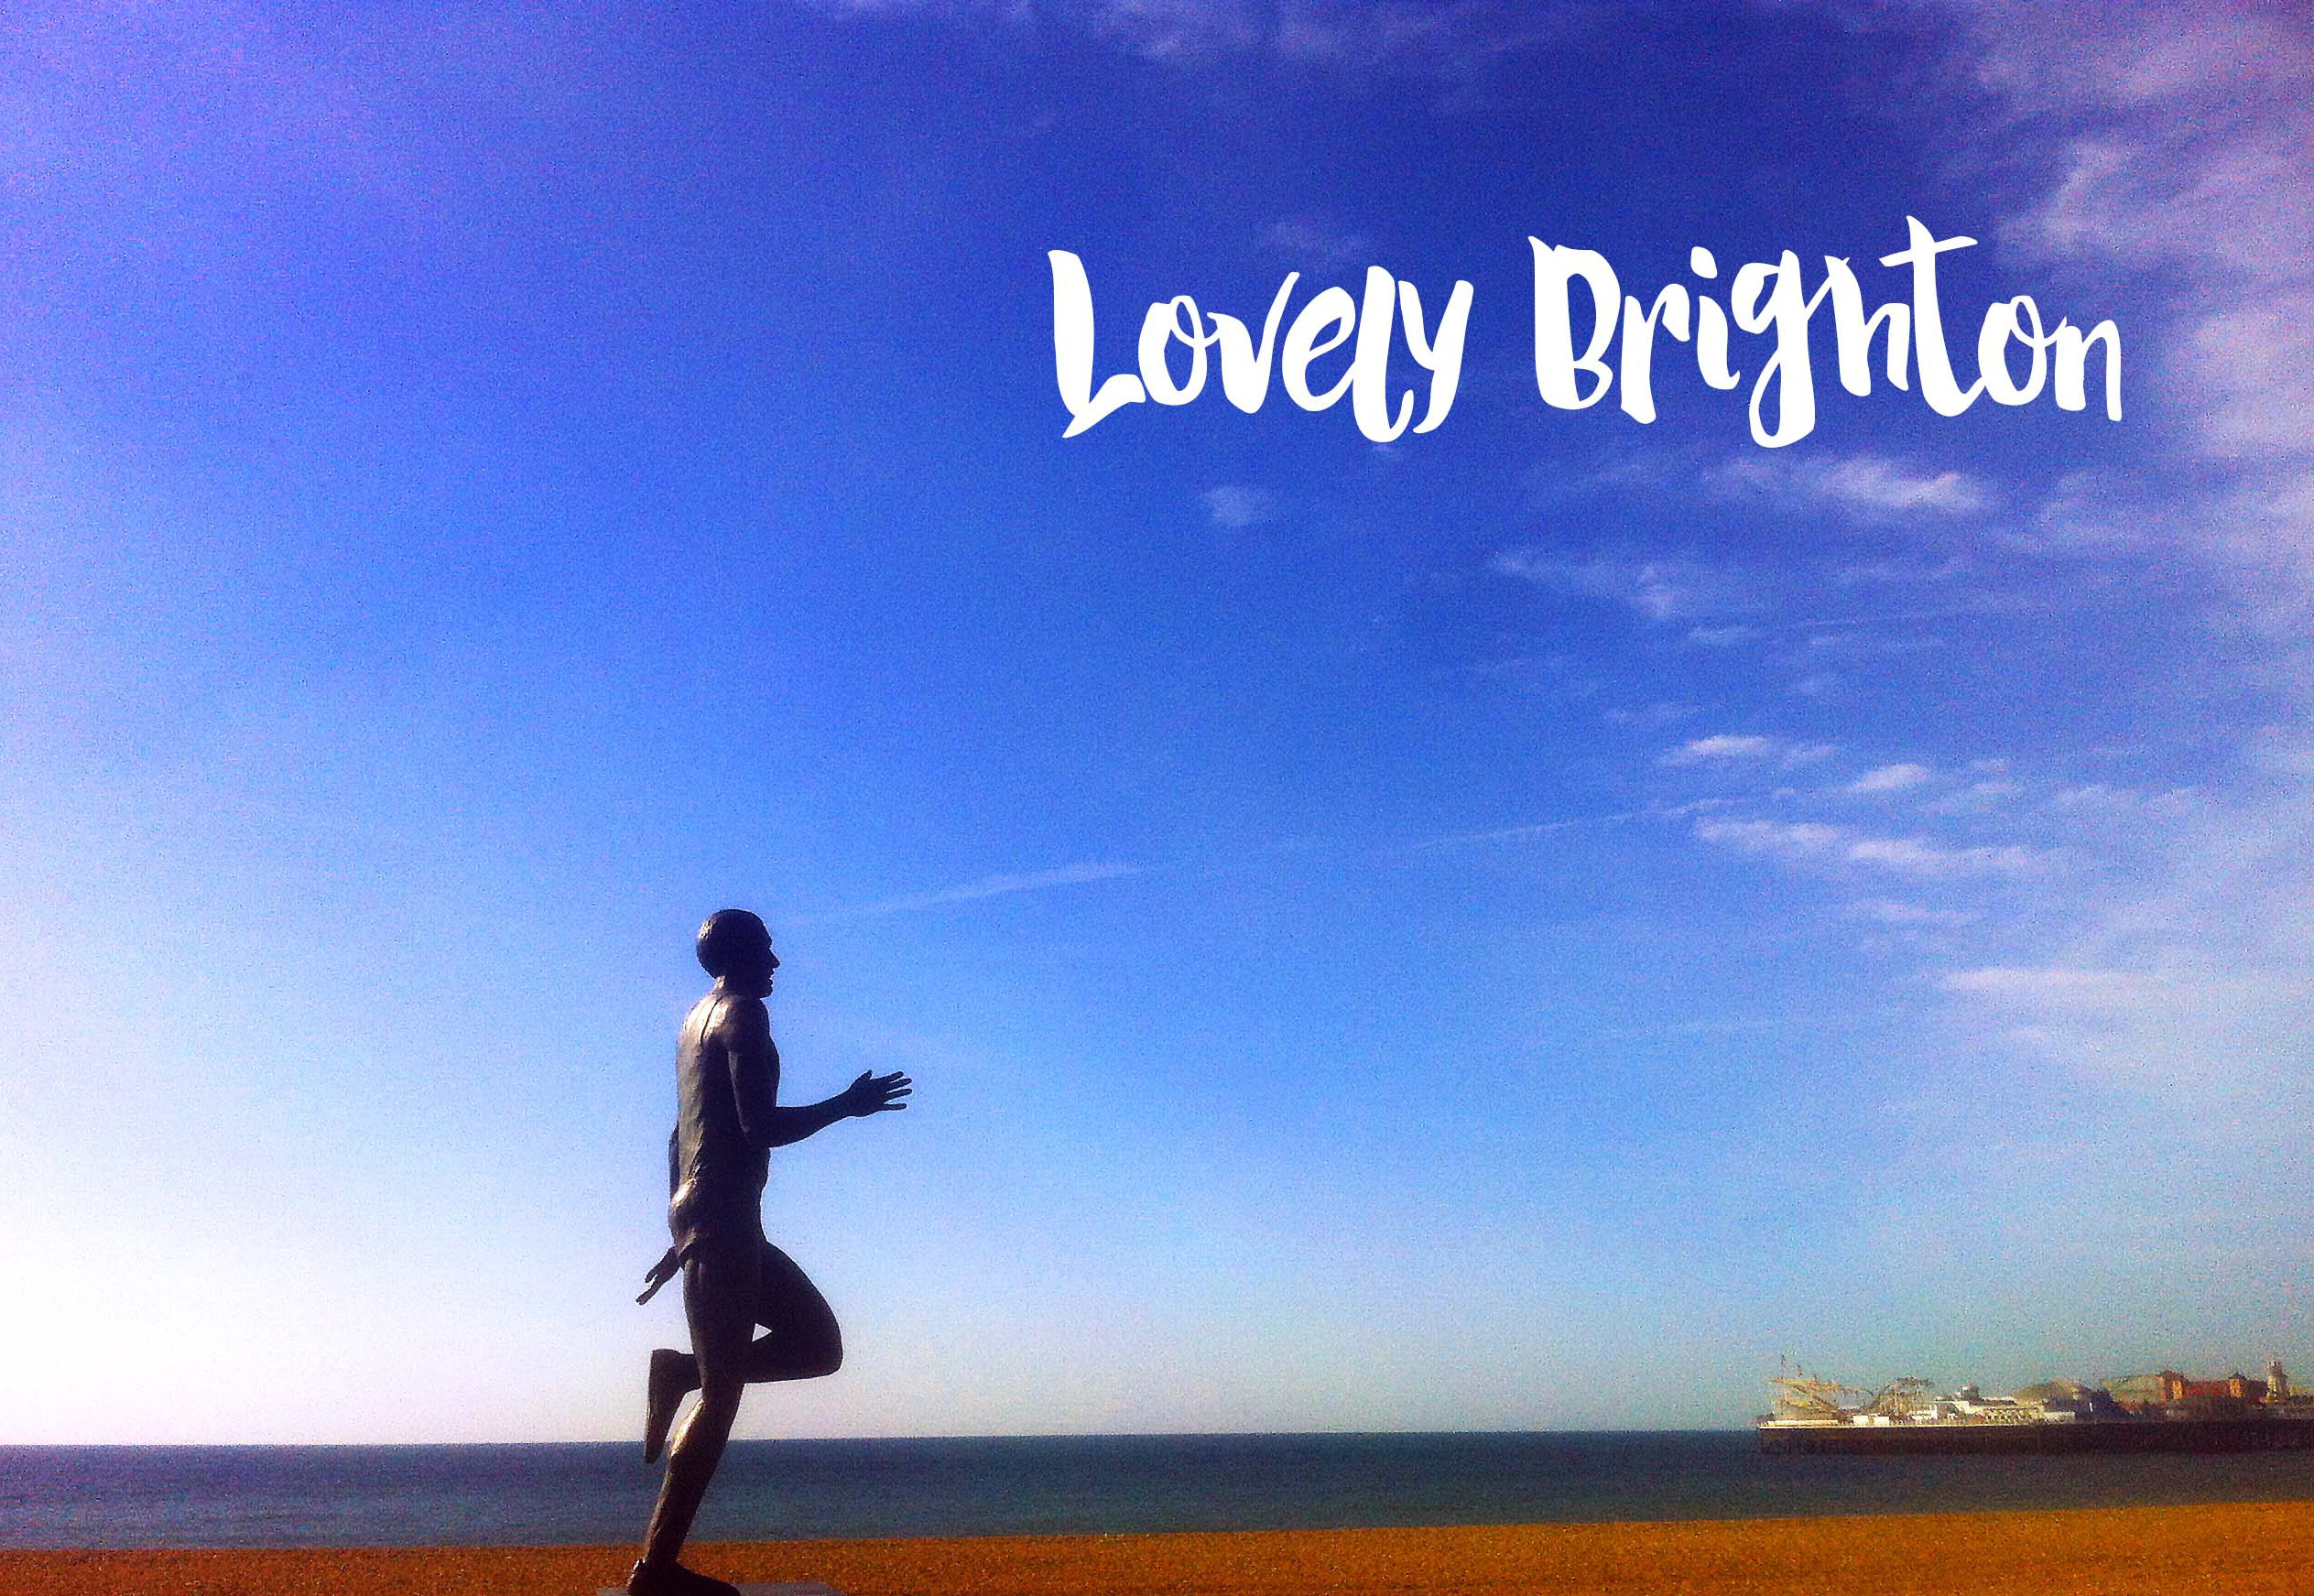 Brighton header